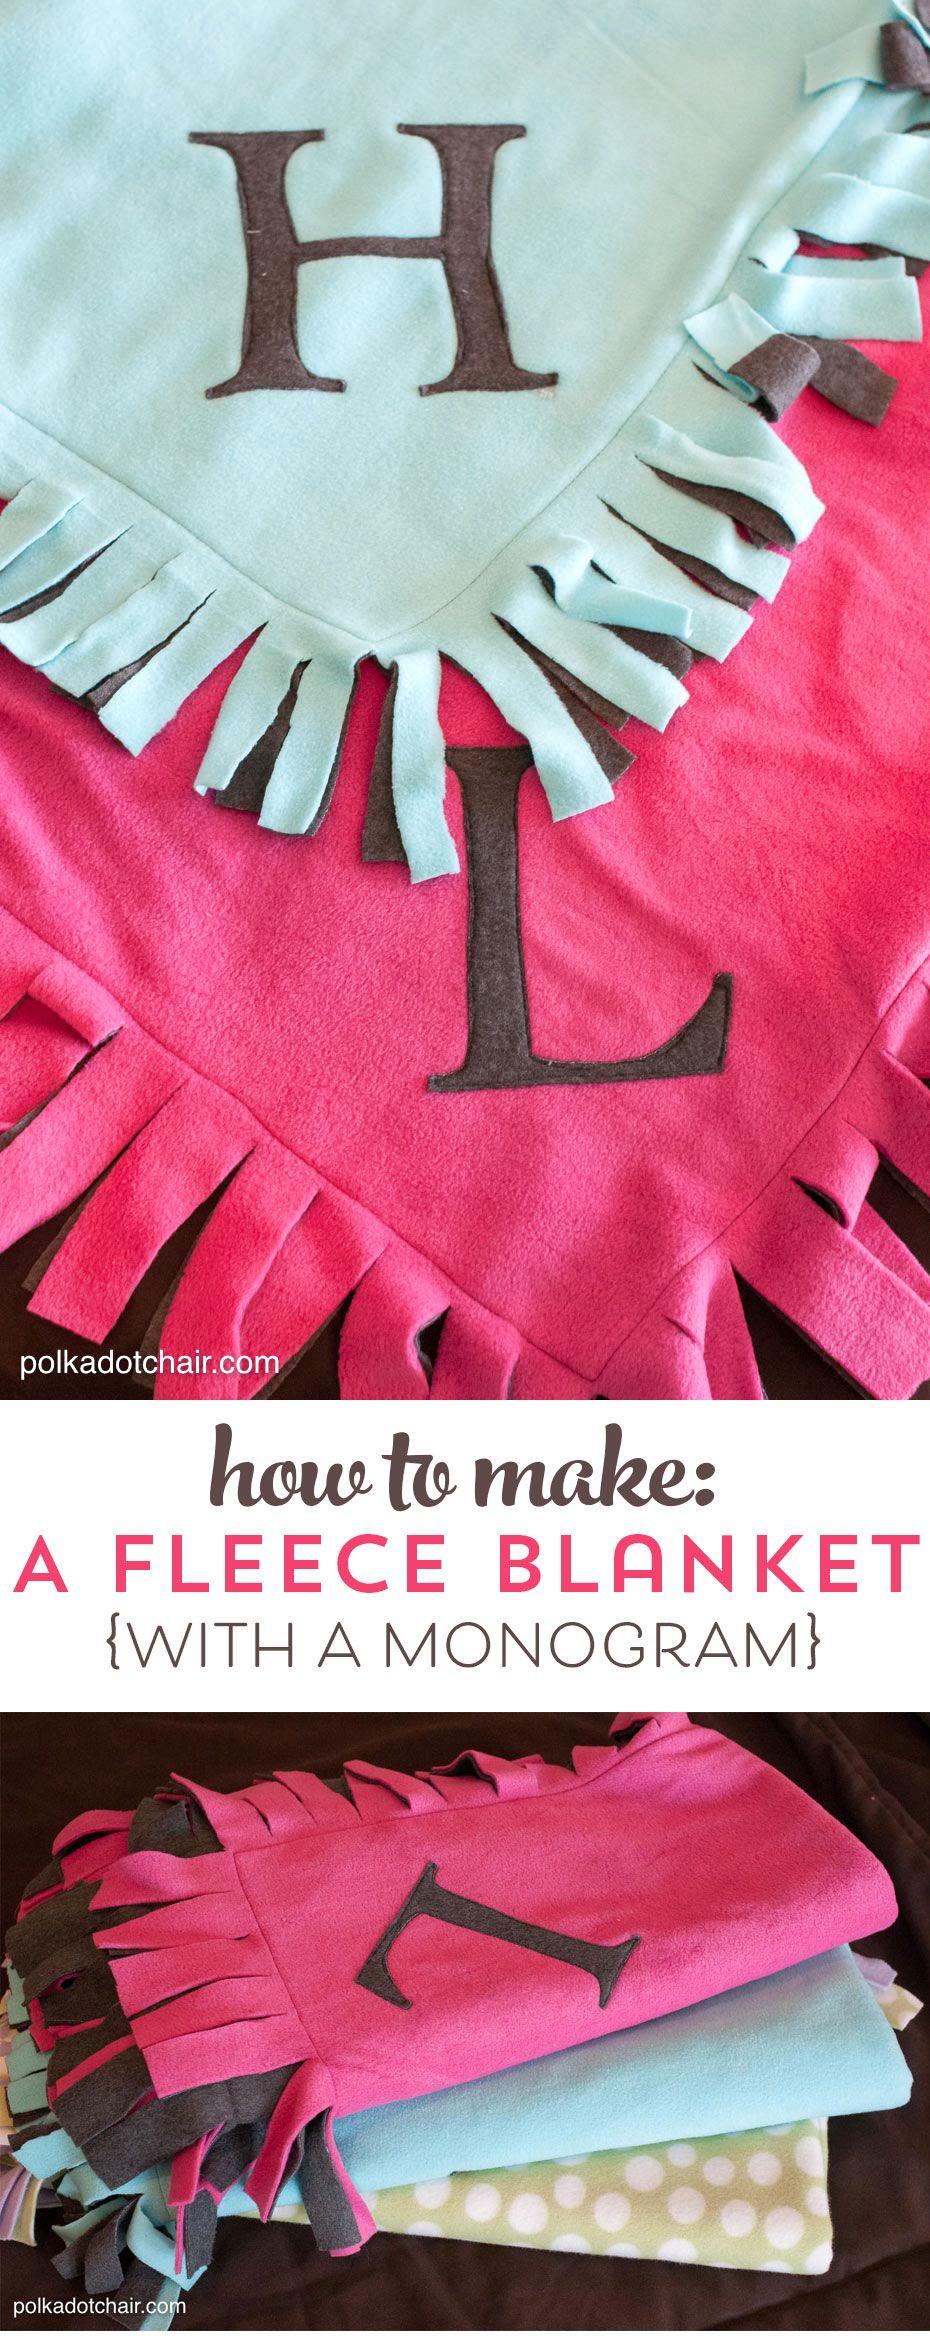 Easy peasy fleece blanket tutorial the polkadot chair sewing